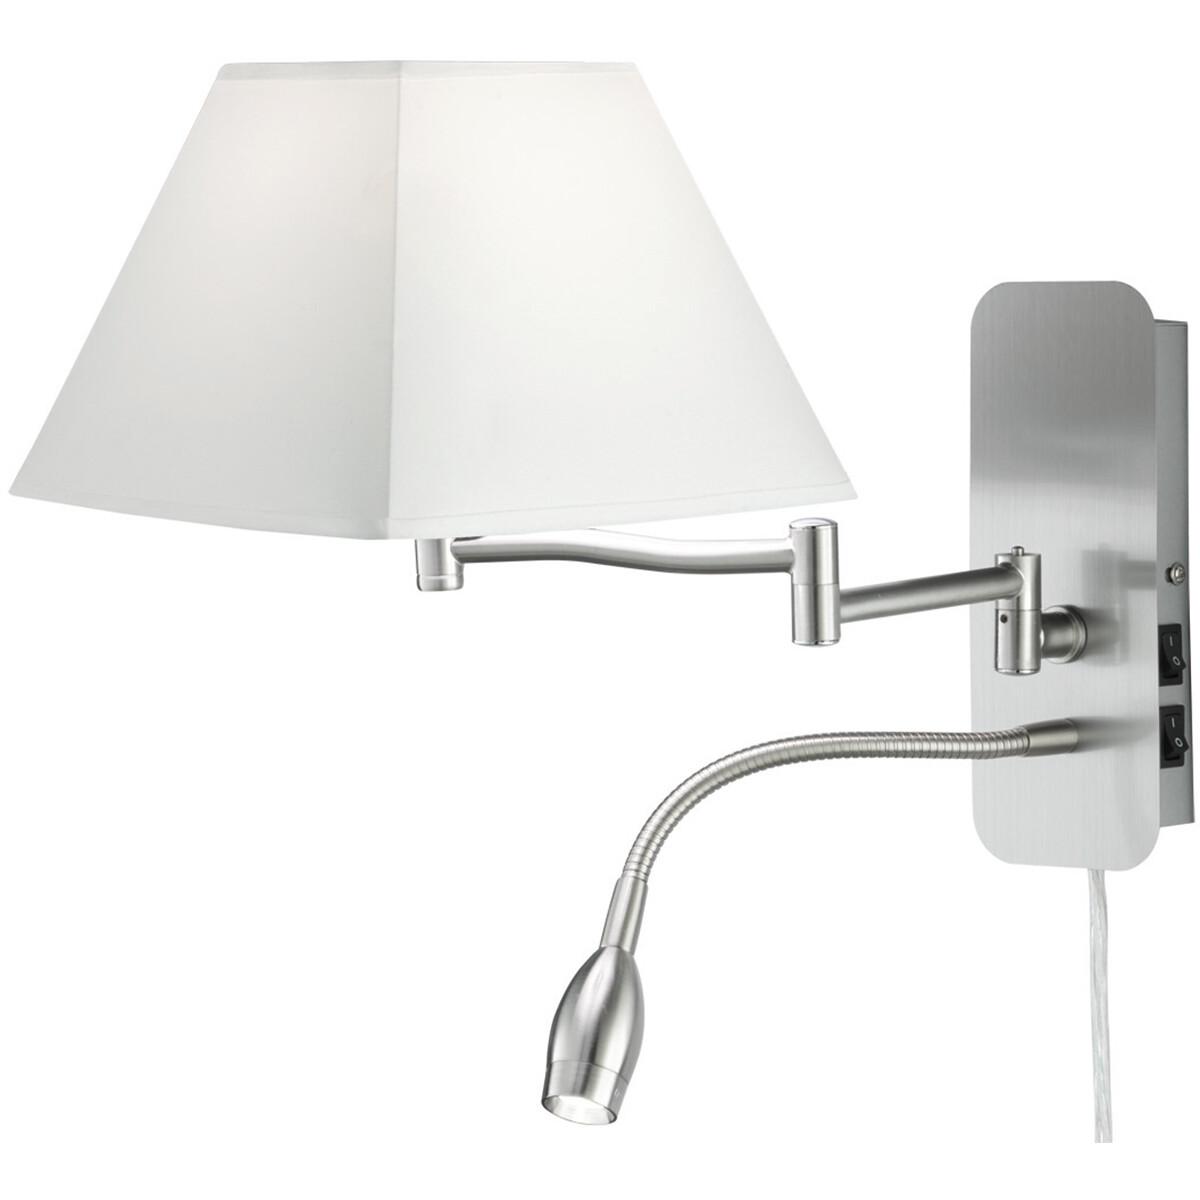 OSRAM - LED Wandlamp - Trion Hotia - E14 Fitting - 3W - Warm Wit 3000K - Vierkant - Mat Wit - Alumin